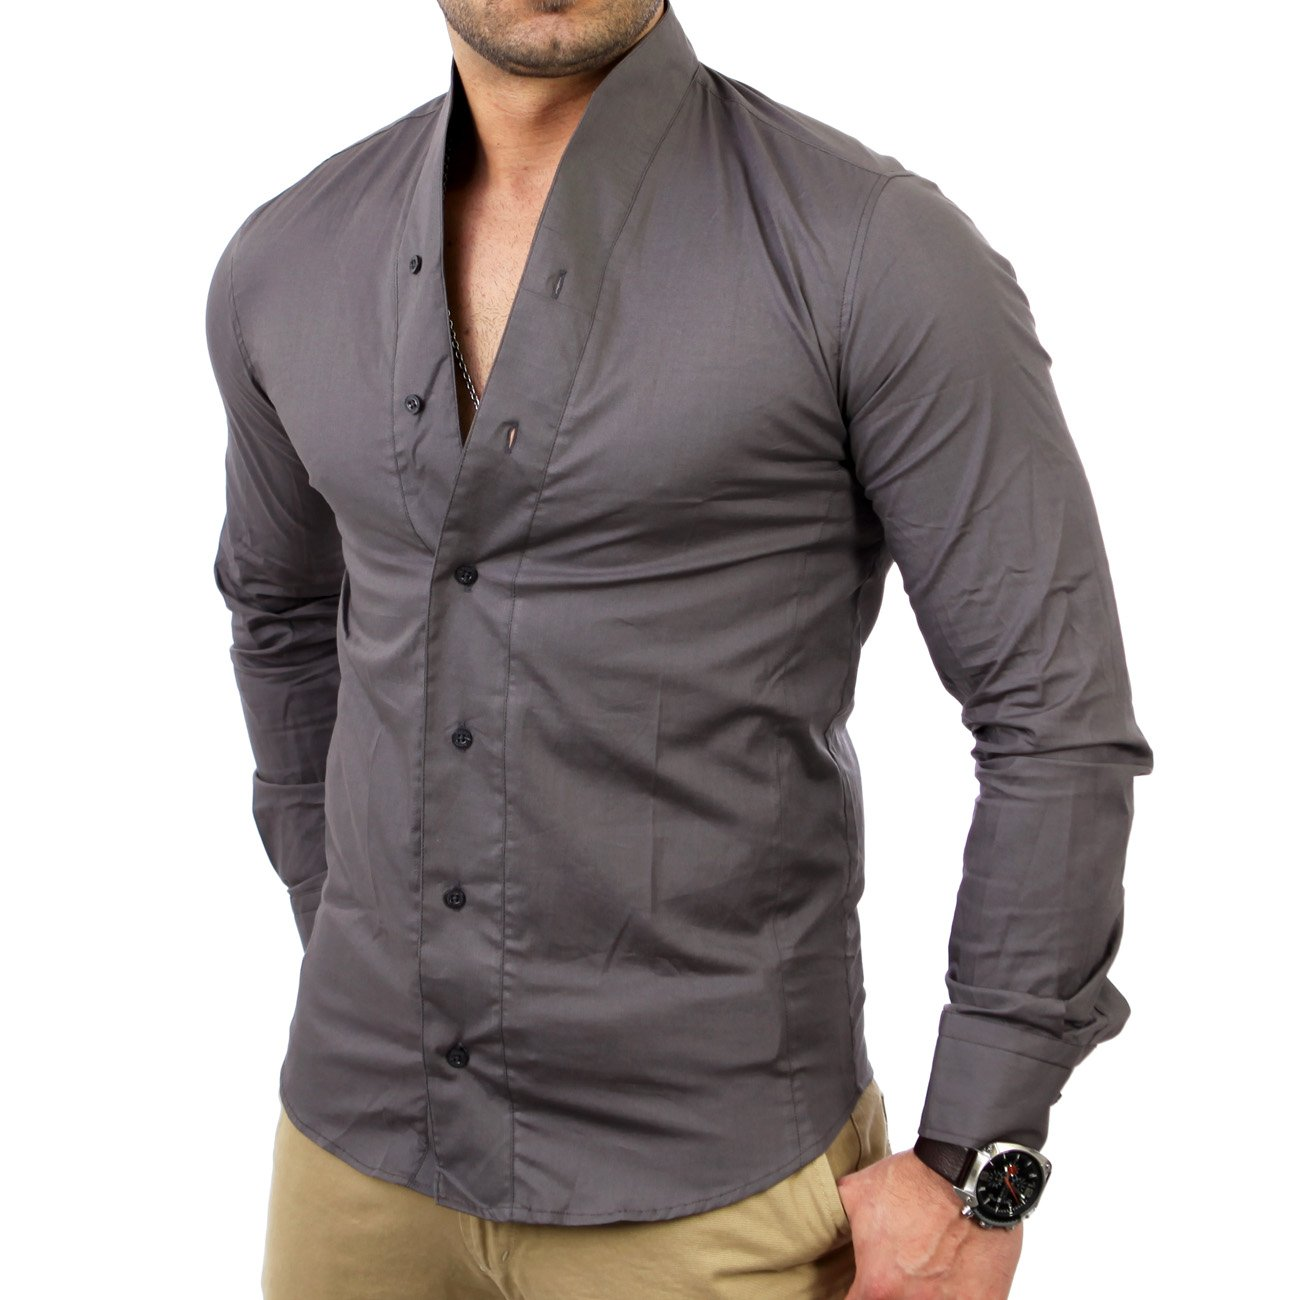 langarmhemd herren stehkragen reslad hemden g nstig. Black Bedroom Furniture Sets. Home Design Ideas